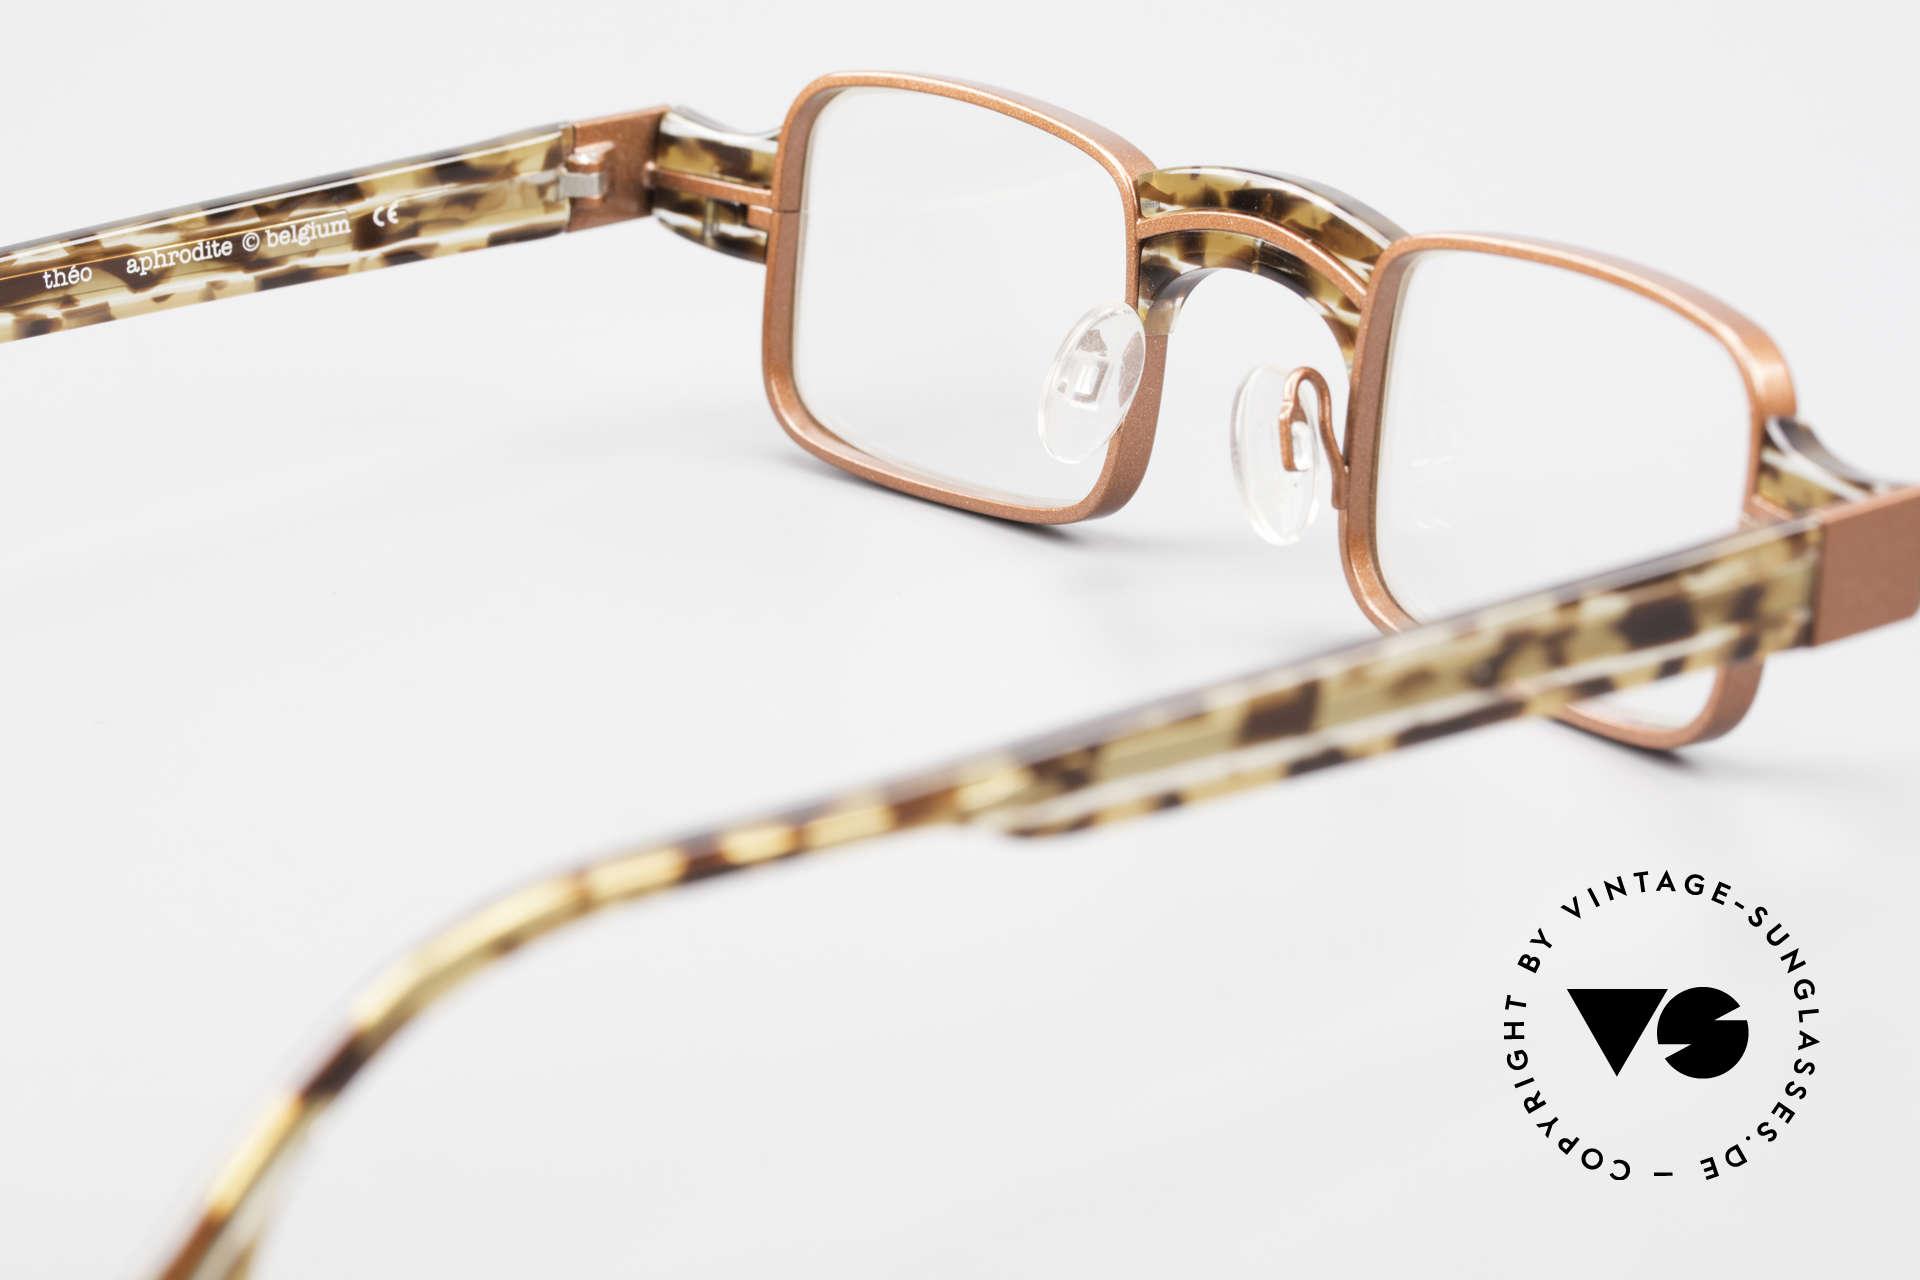 Theo Belgium Aphrodite Vintage Ladies Designer Specs, unworn vintage eyeglass-frame (with representativeness), Made for Women